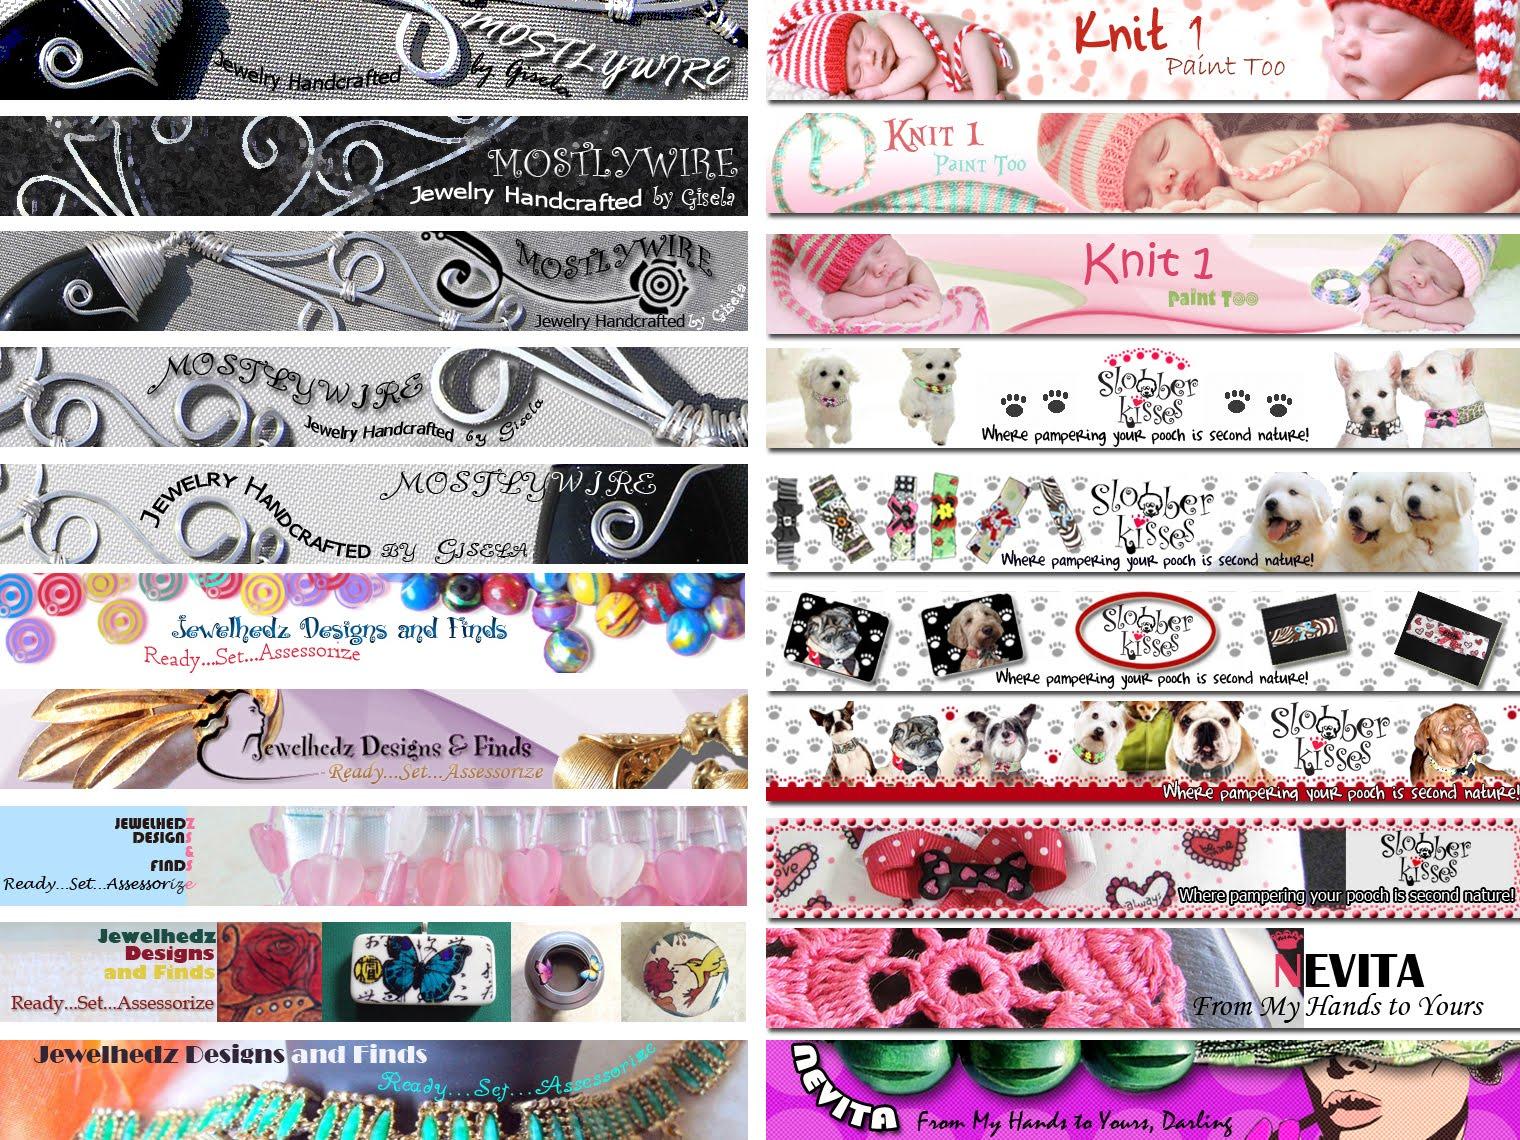 Design banner for etsy - Custom Made Etsy Shop Banners Graphic Design